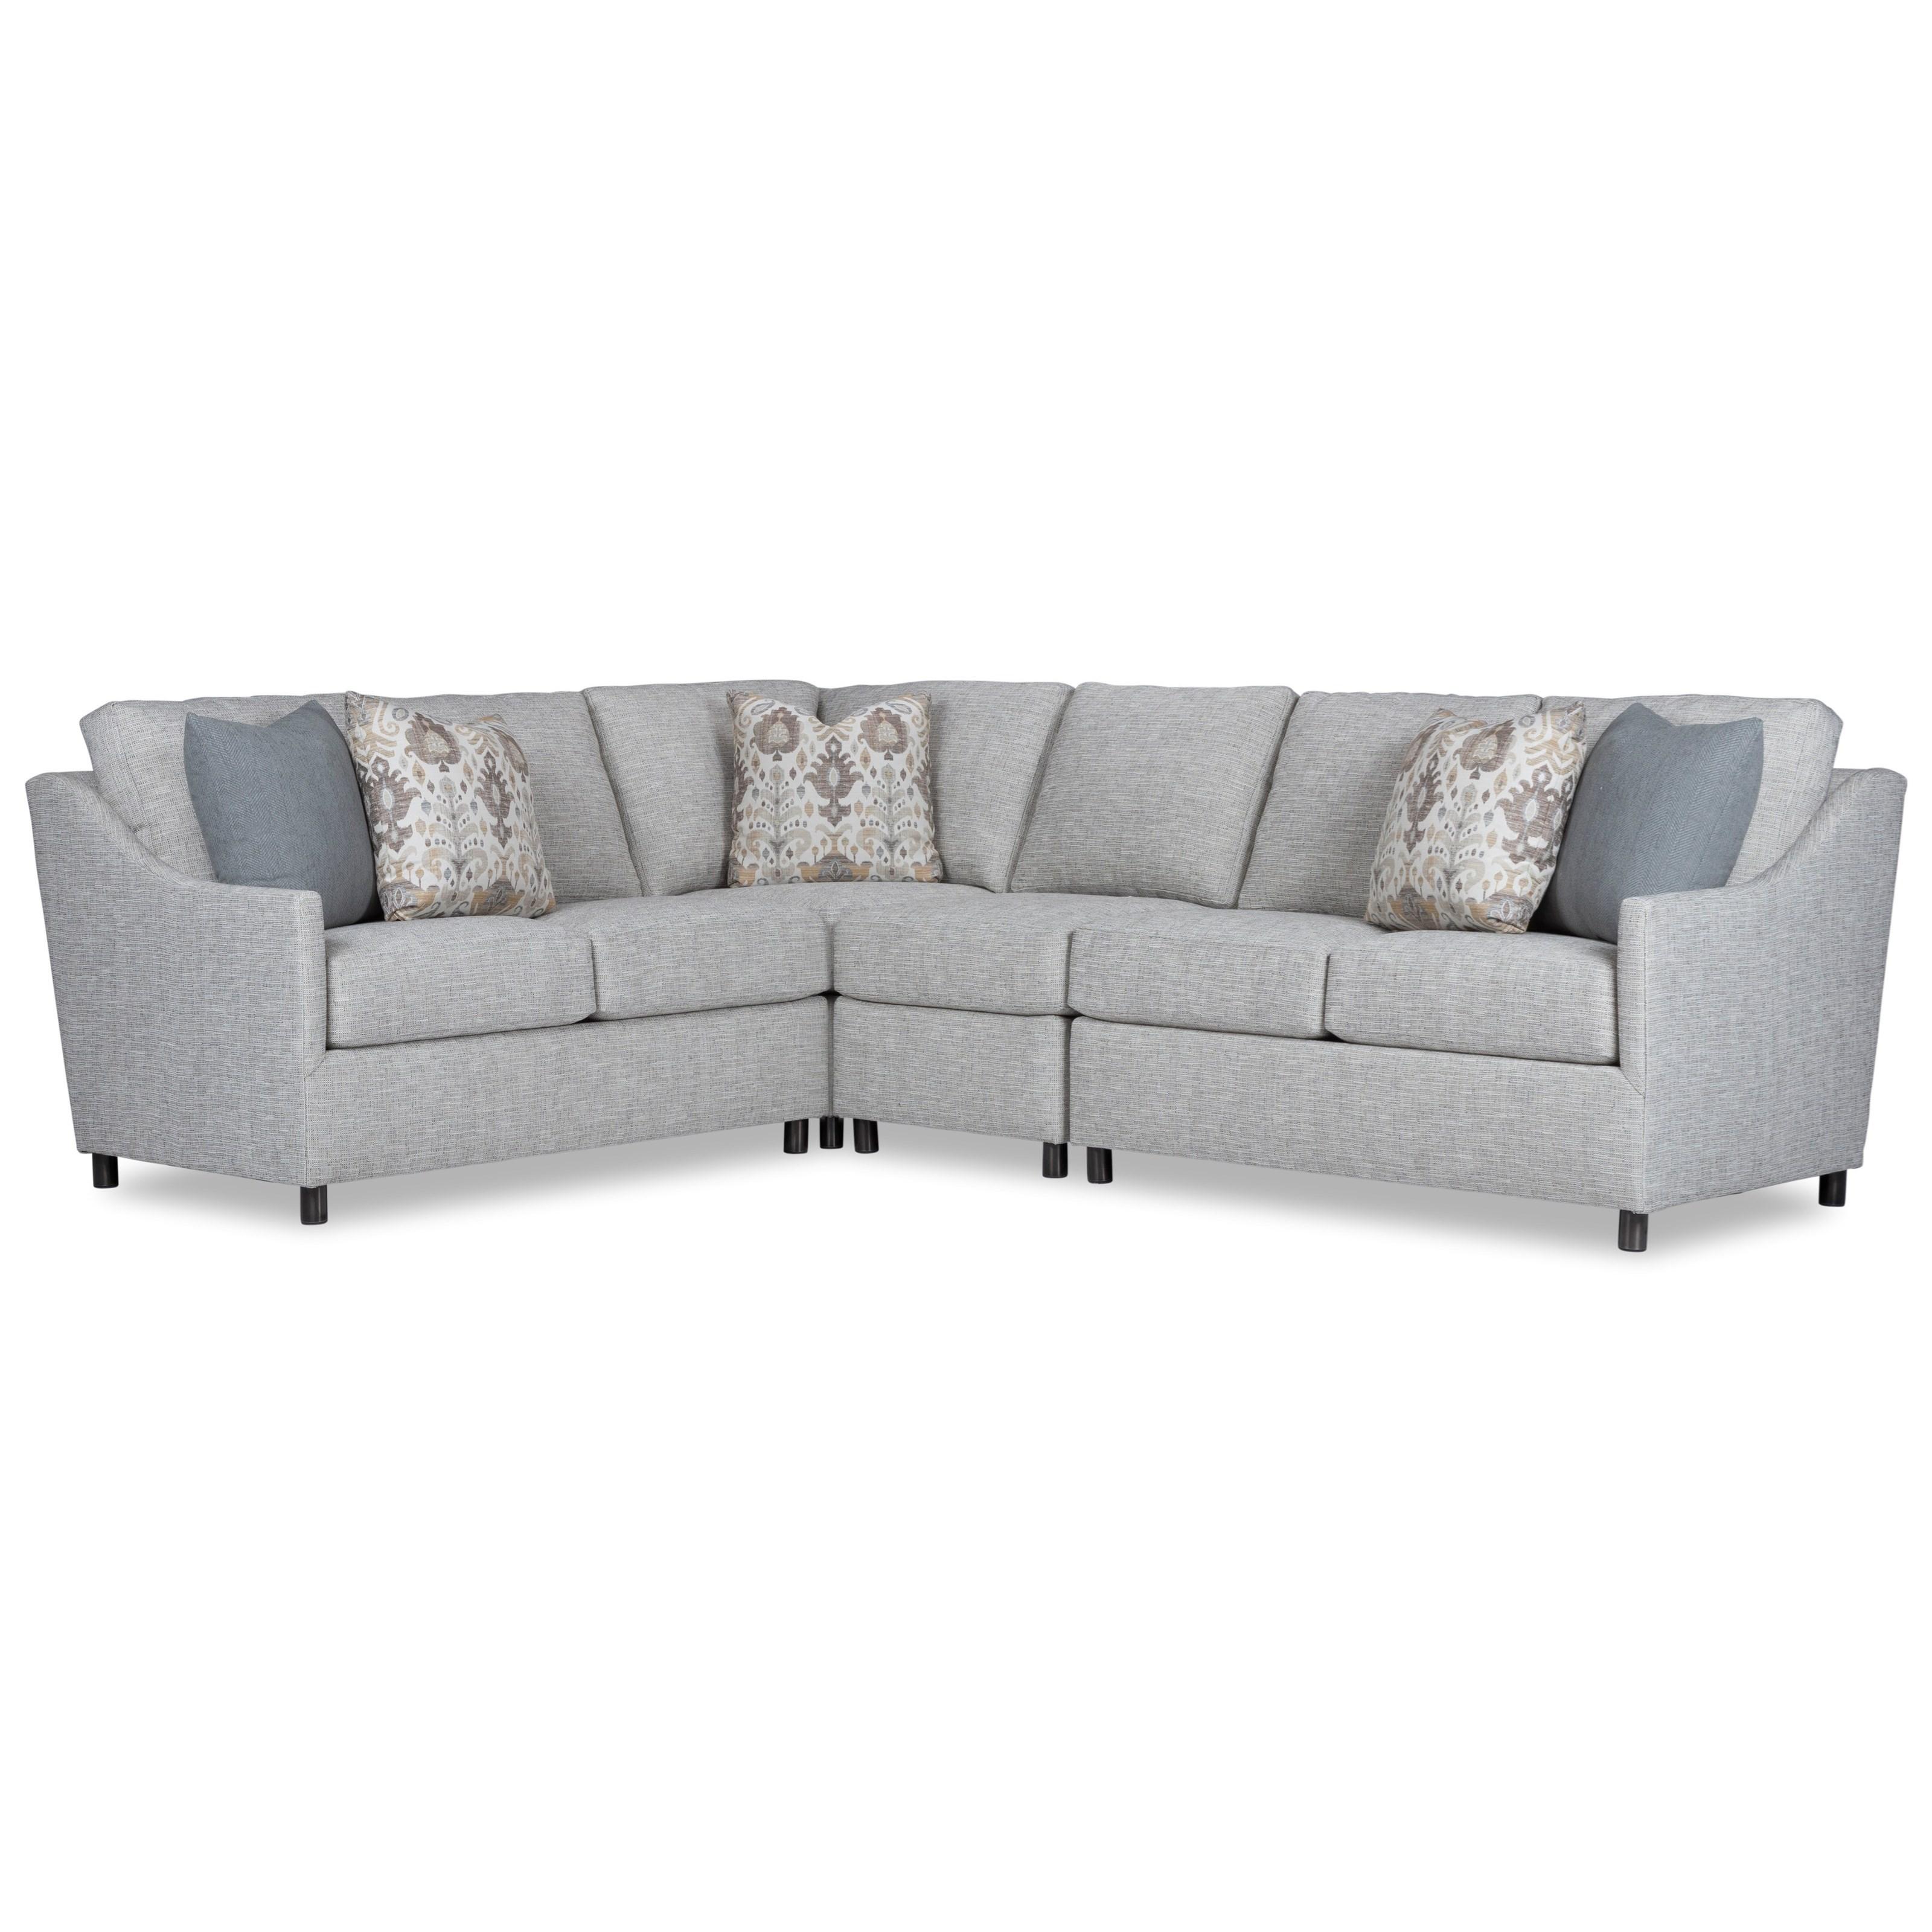 9101 Outdoor Sectional by Geoffrey Alexander at Sprintz Furniture